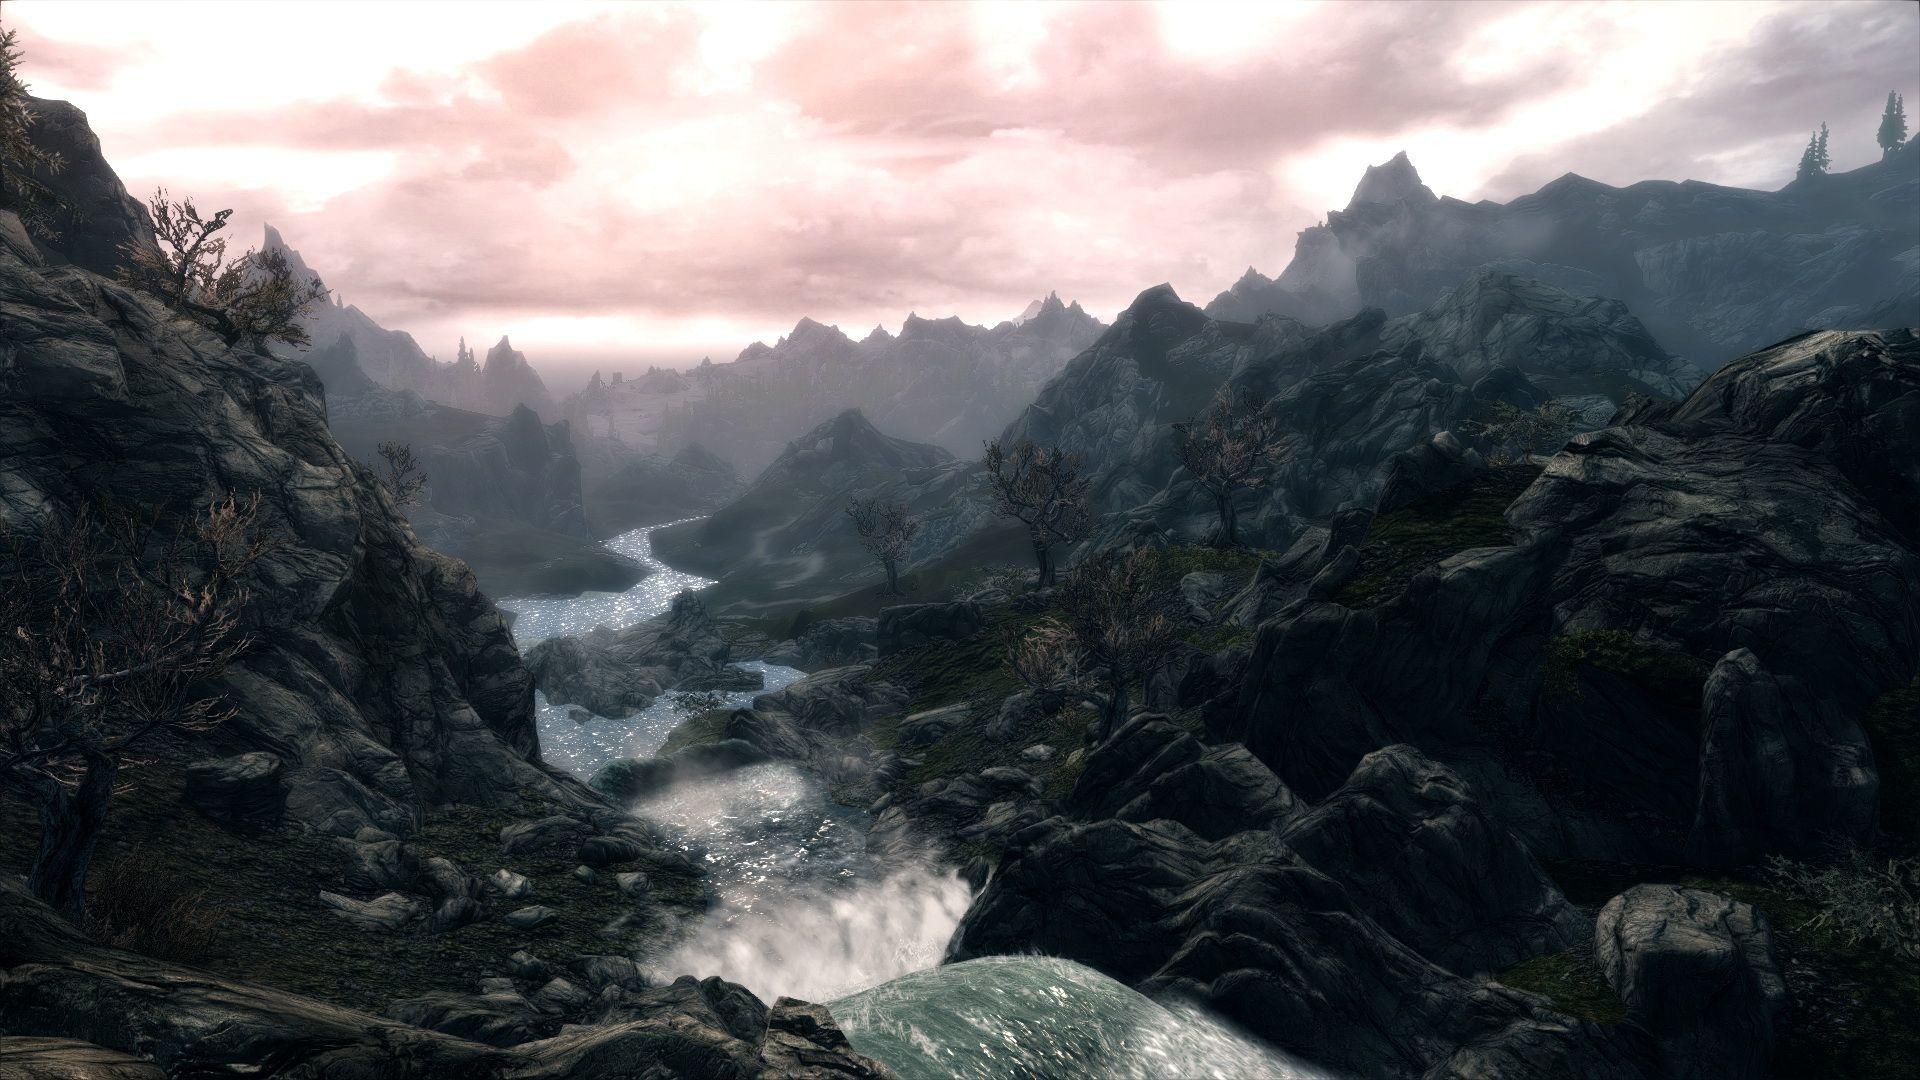 The Elder Scrolls Online Greymoor Poster 4k Ultra Hd Mobile Wallpaper Elder Scrolls Art Elder Scrolls Skyrim Elder Scrolls Online